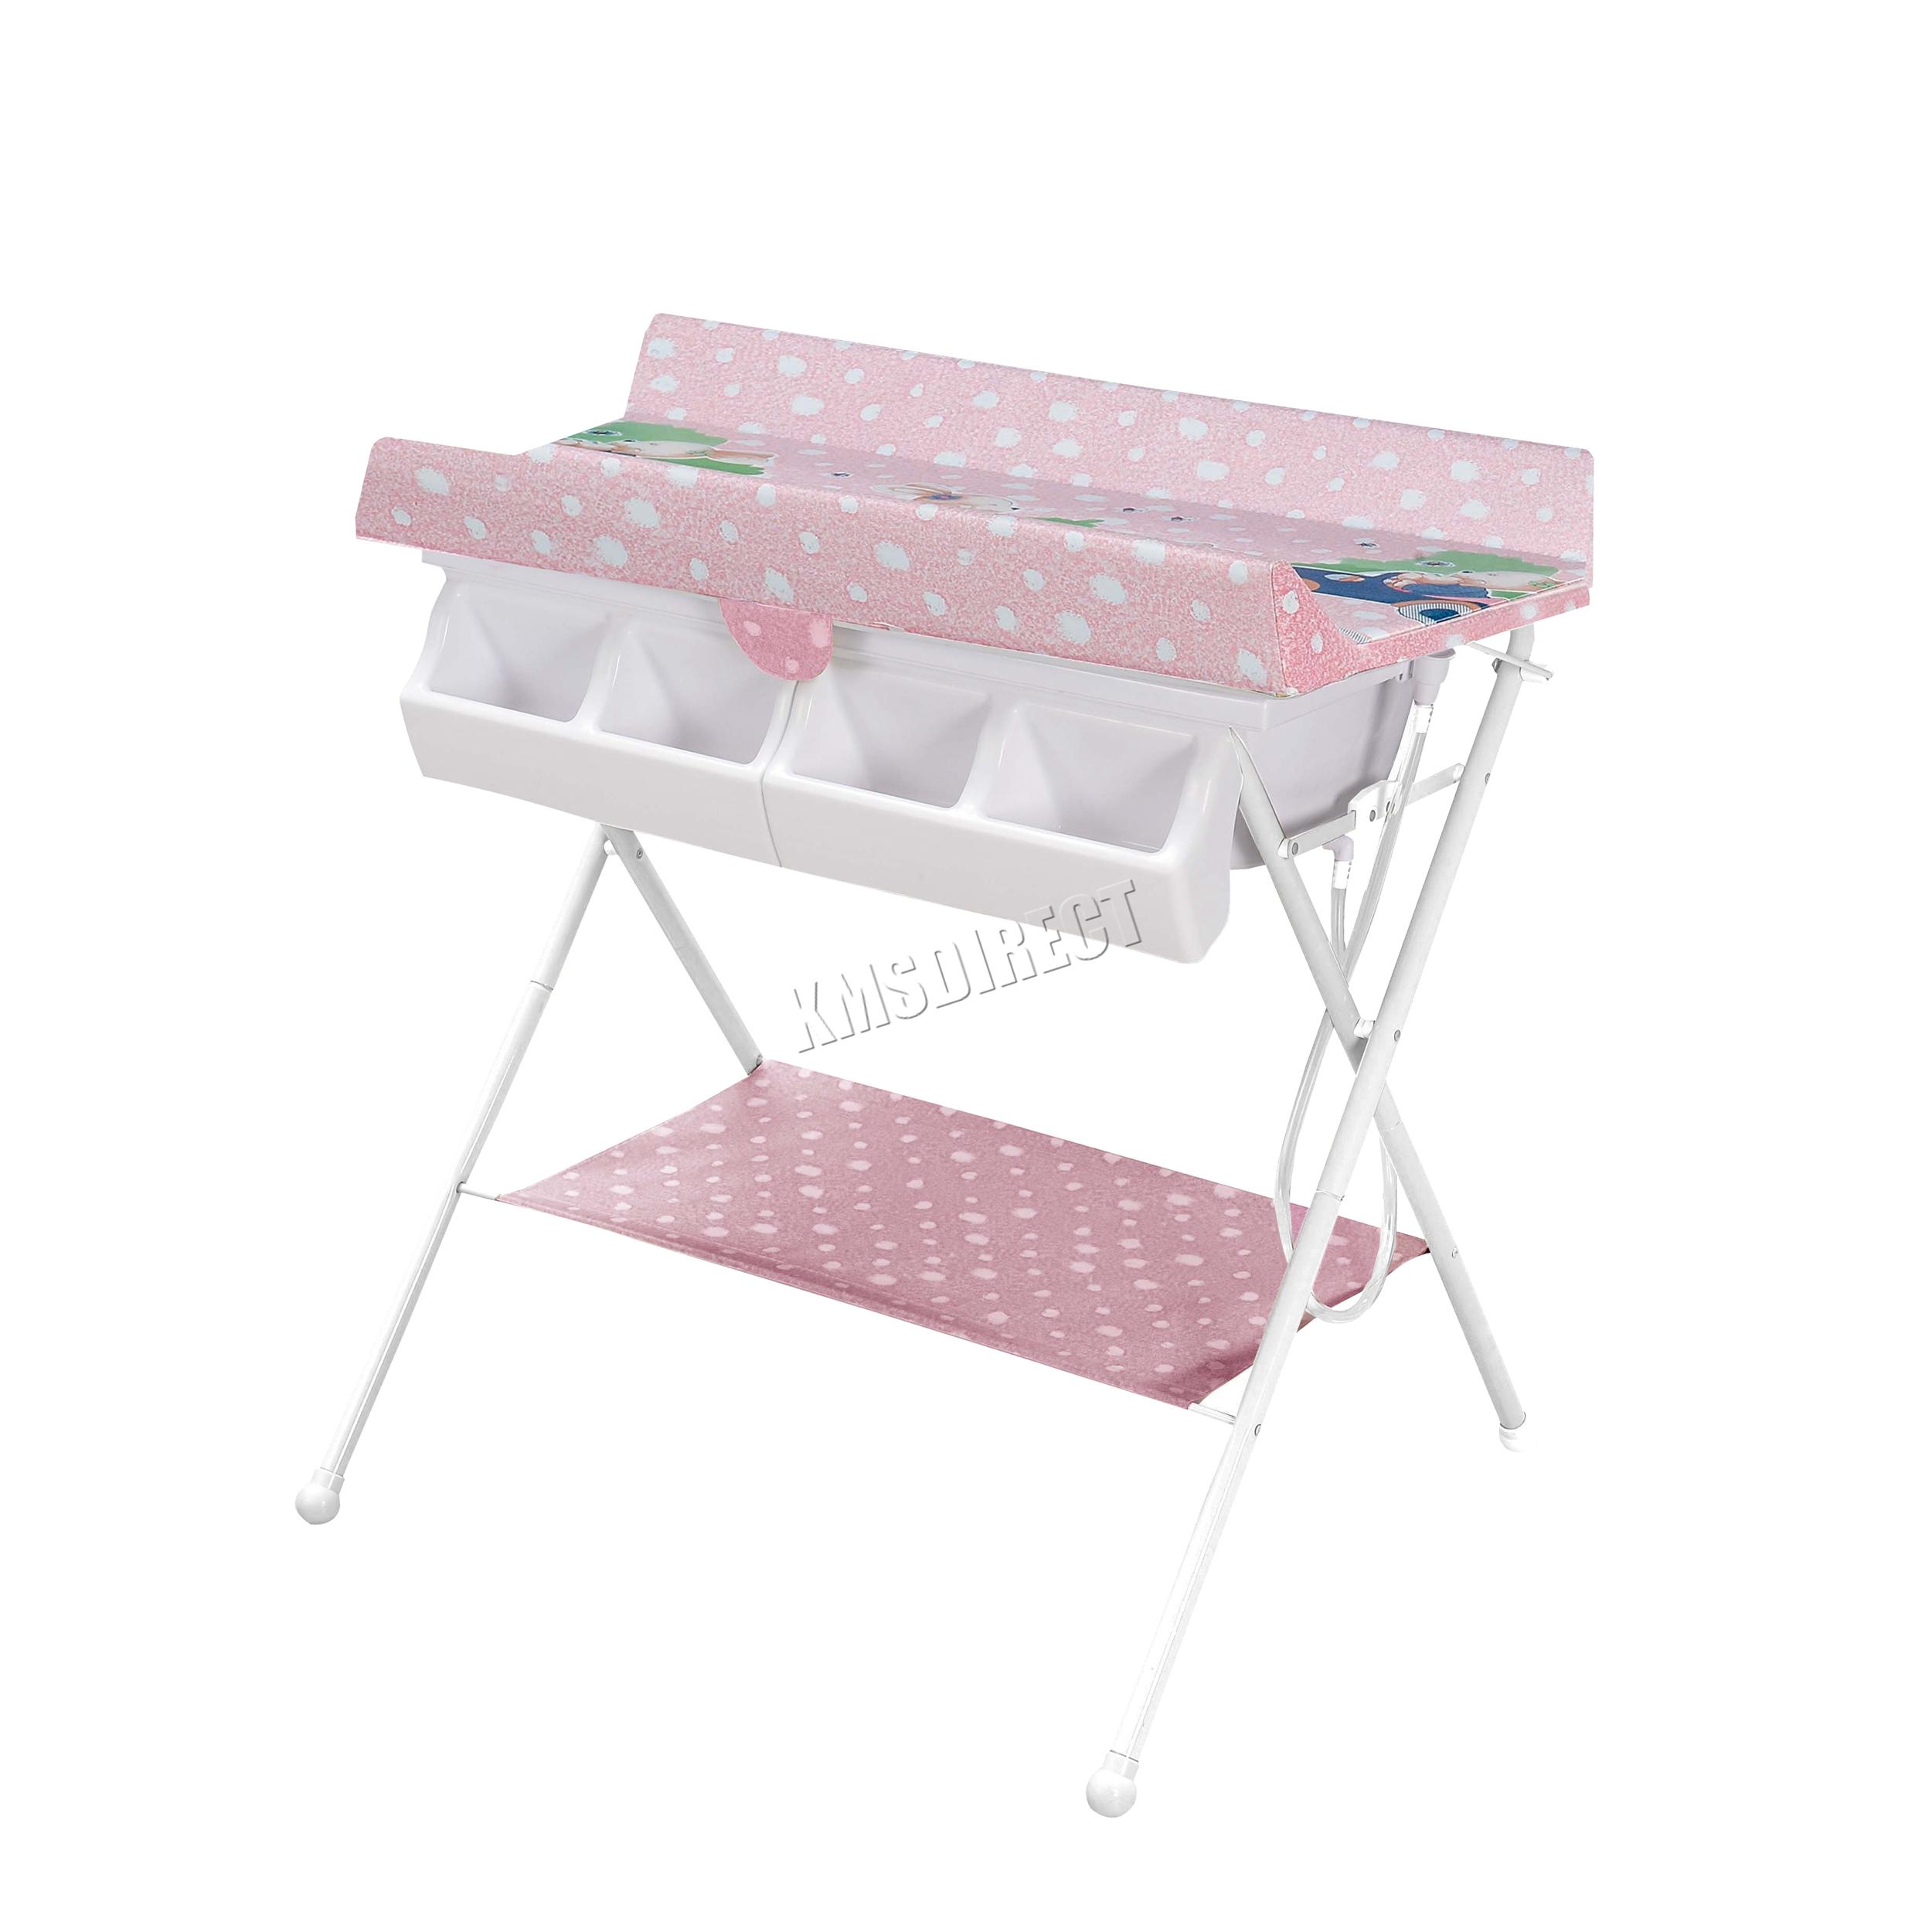 foldable changing table homesfeed sentinel foxhunter foldable baby bath changing table unit infant nursery trays rail bct01